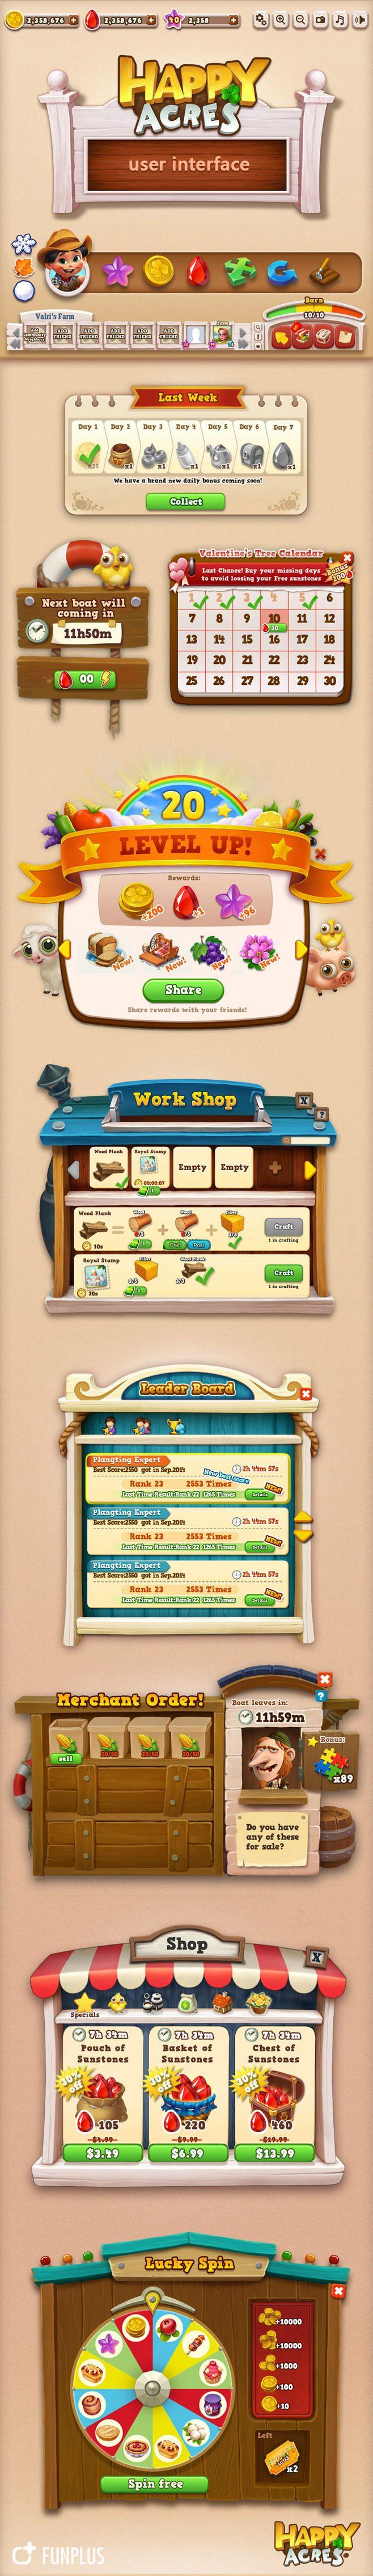 Game UI@tonyCM采集到game UI(1496图)_花瓣UI/UX